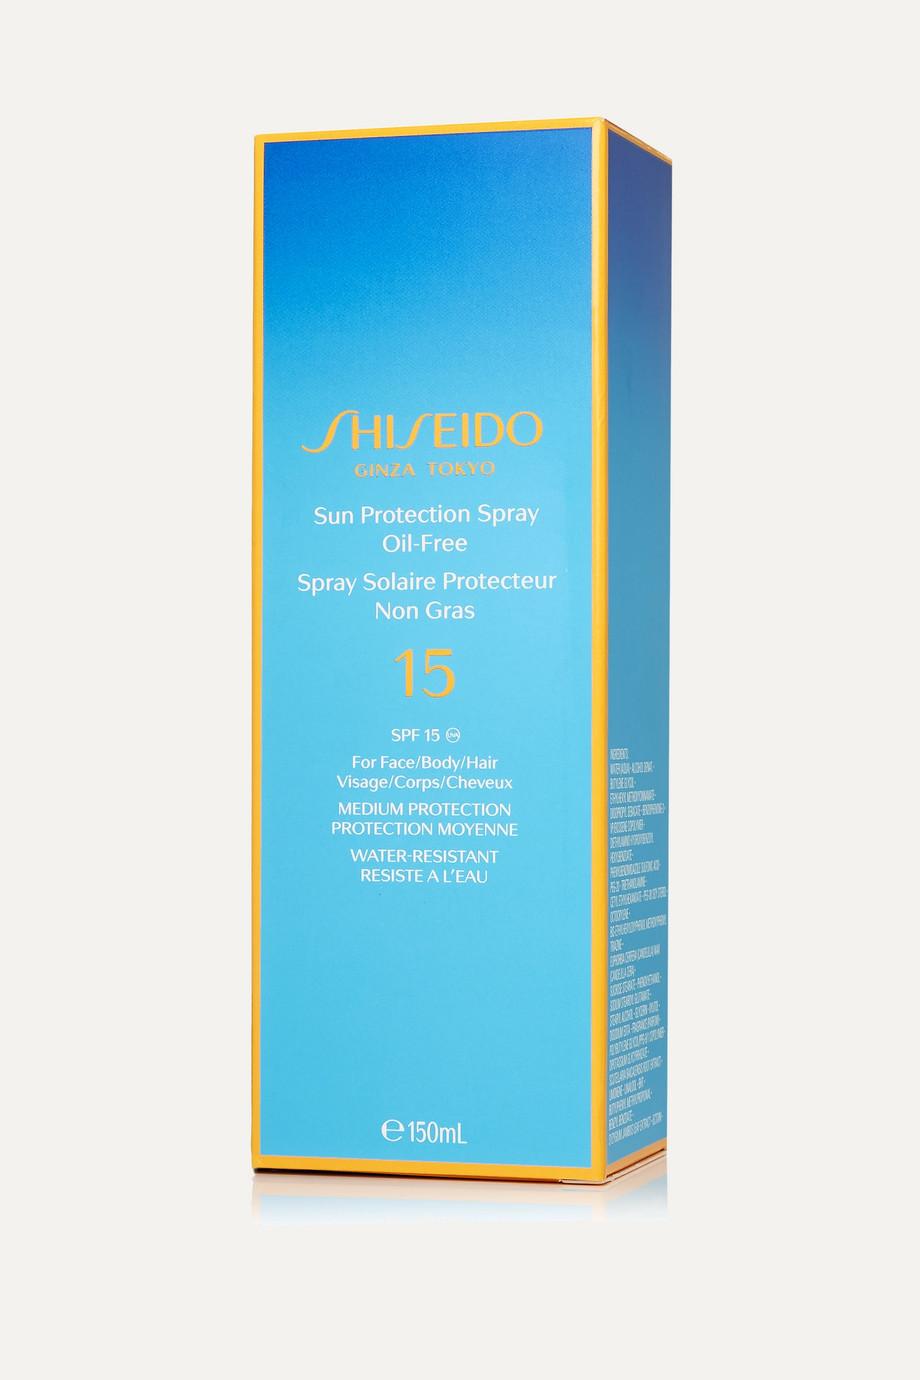 Shiseido Sun Protection Spray Oil-Free SPF15, 150ml